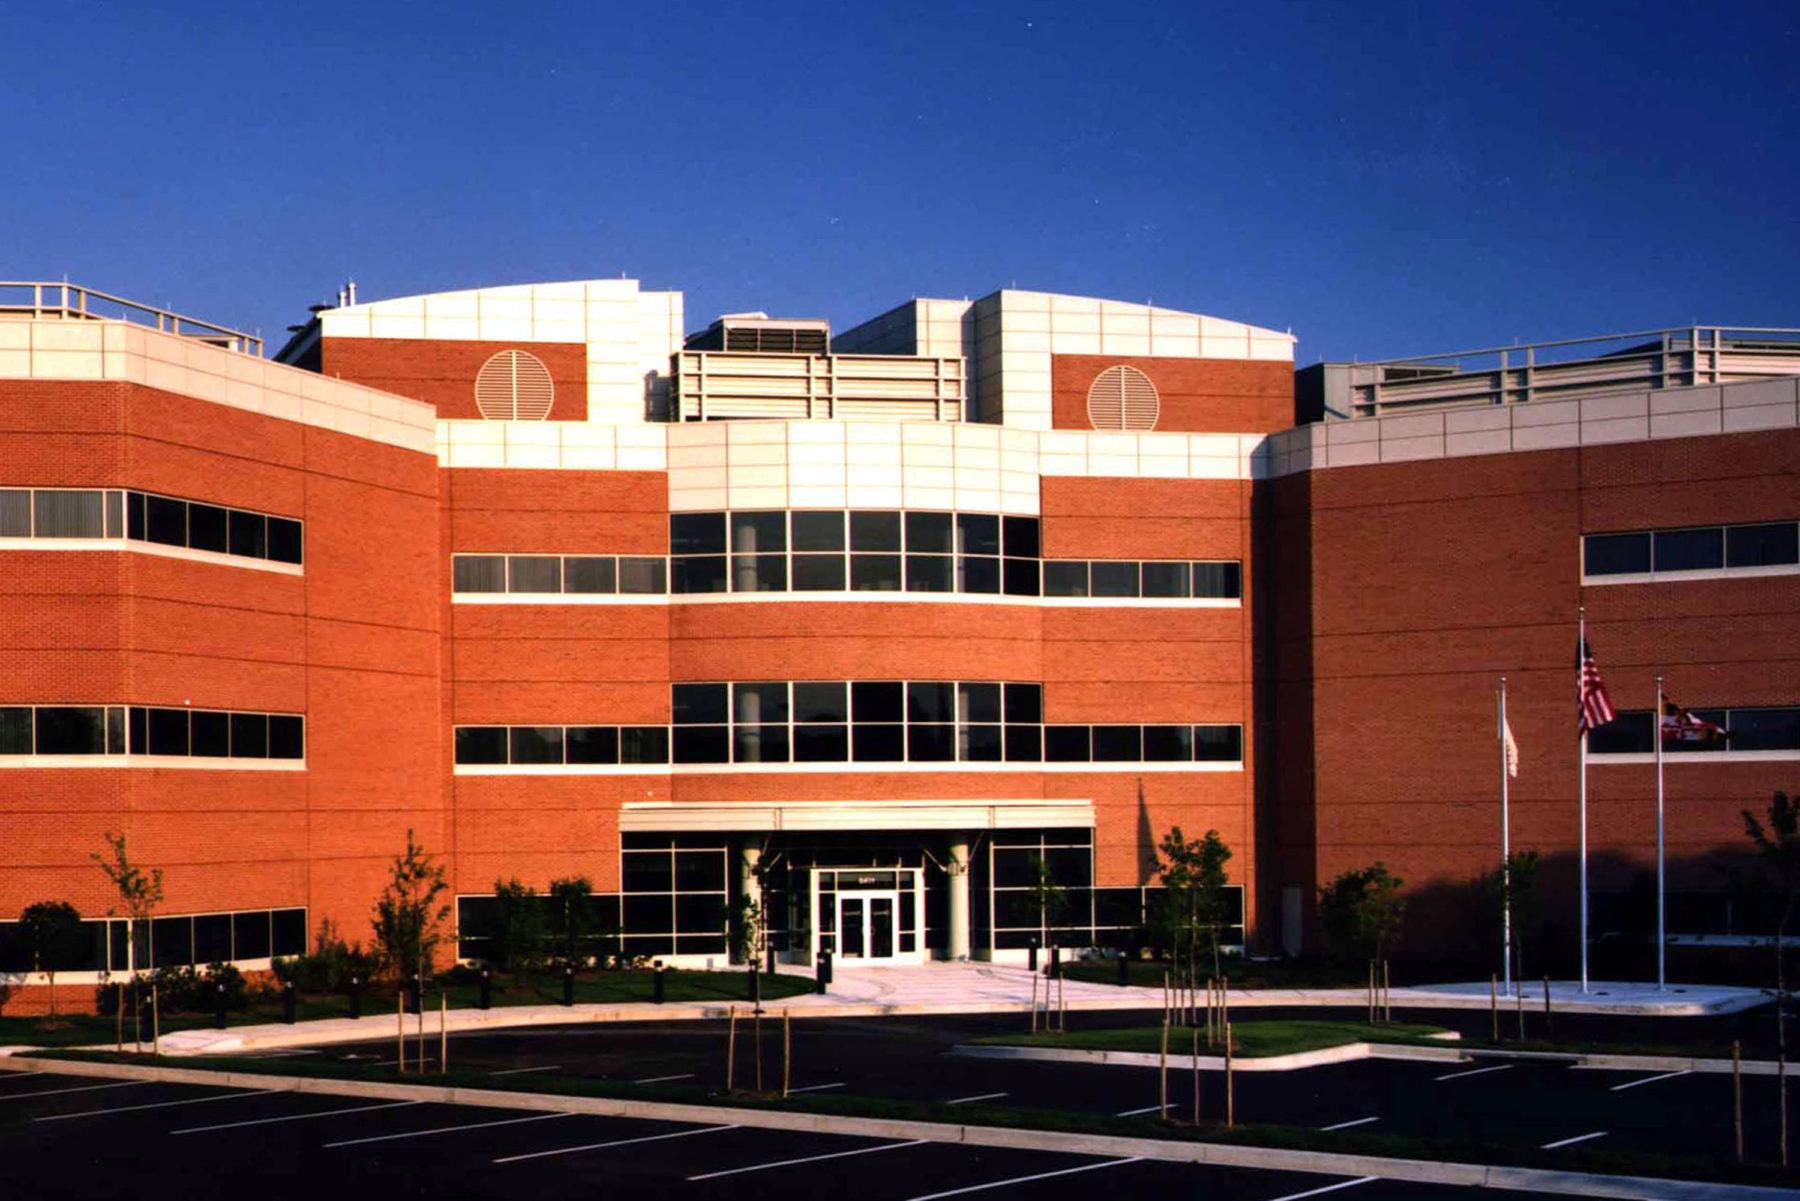 EISAI Pharmaceuticals Research & Development Facility